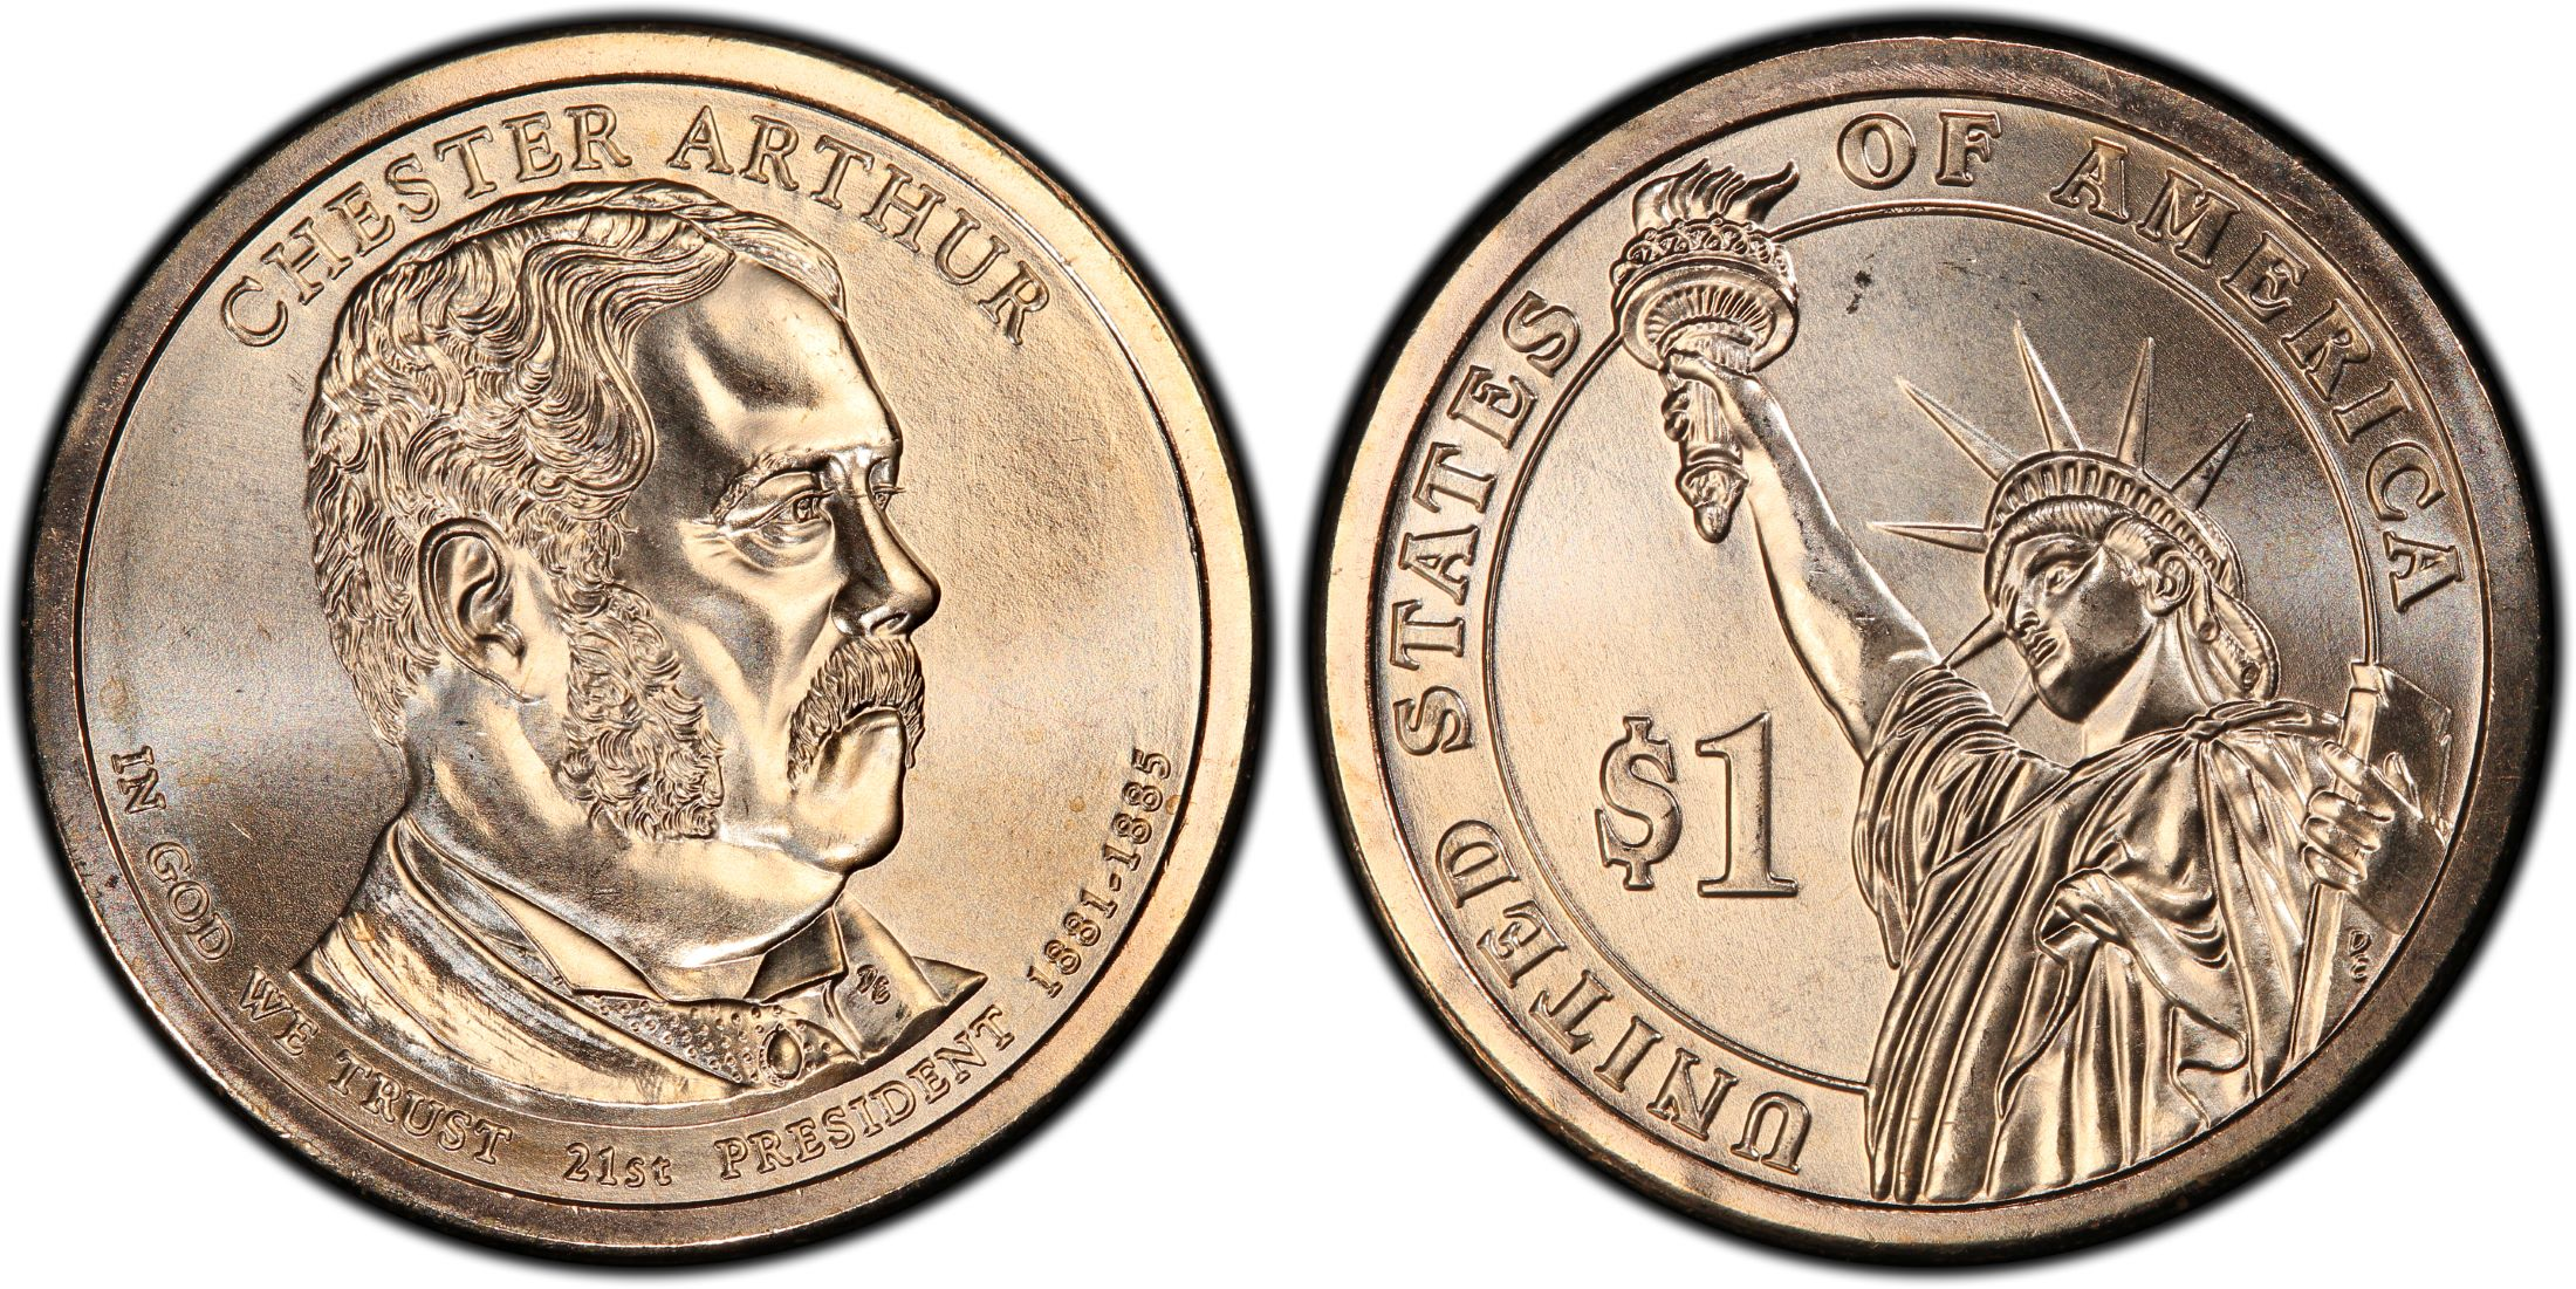 P 2012 Chester Arthur Presidential $1 Coin Roll